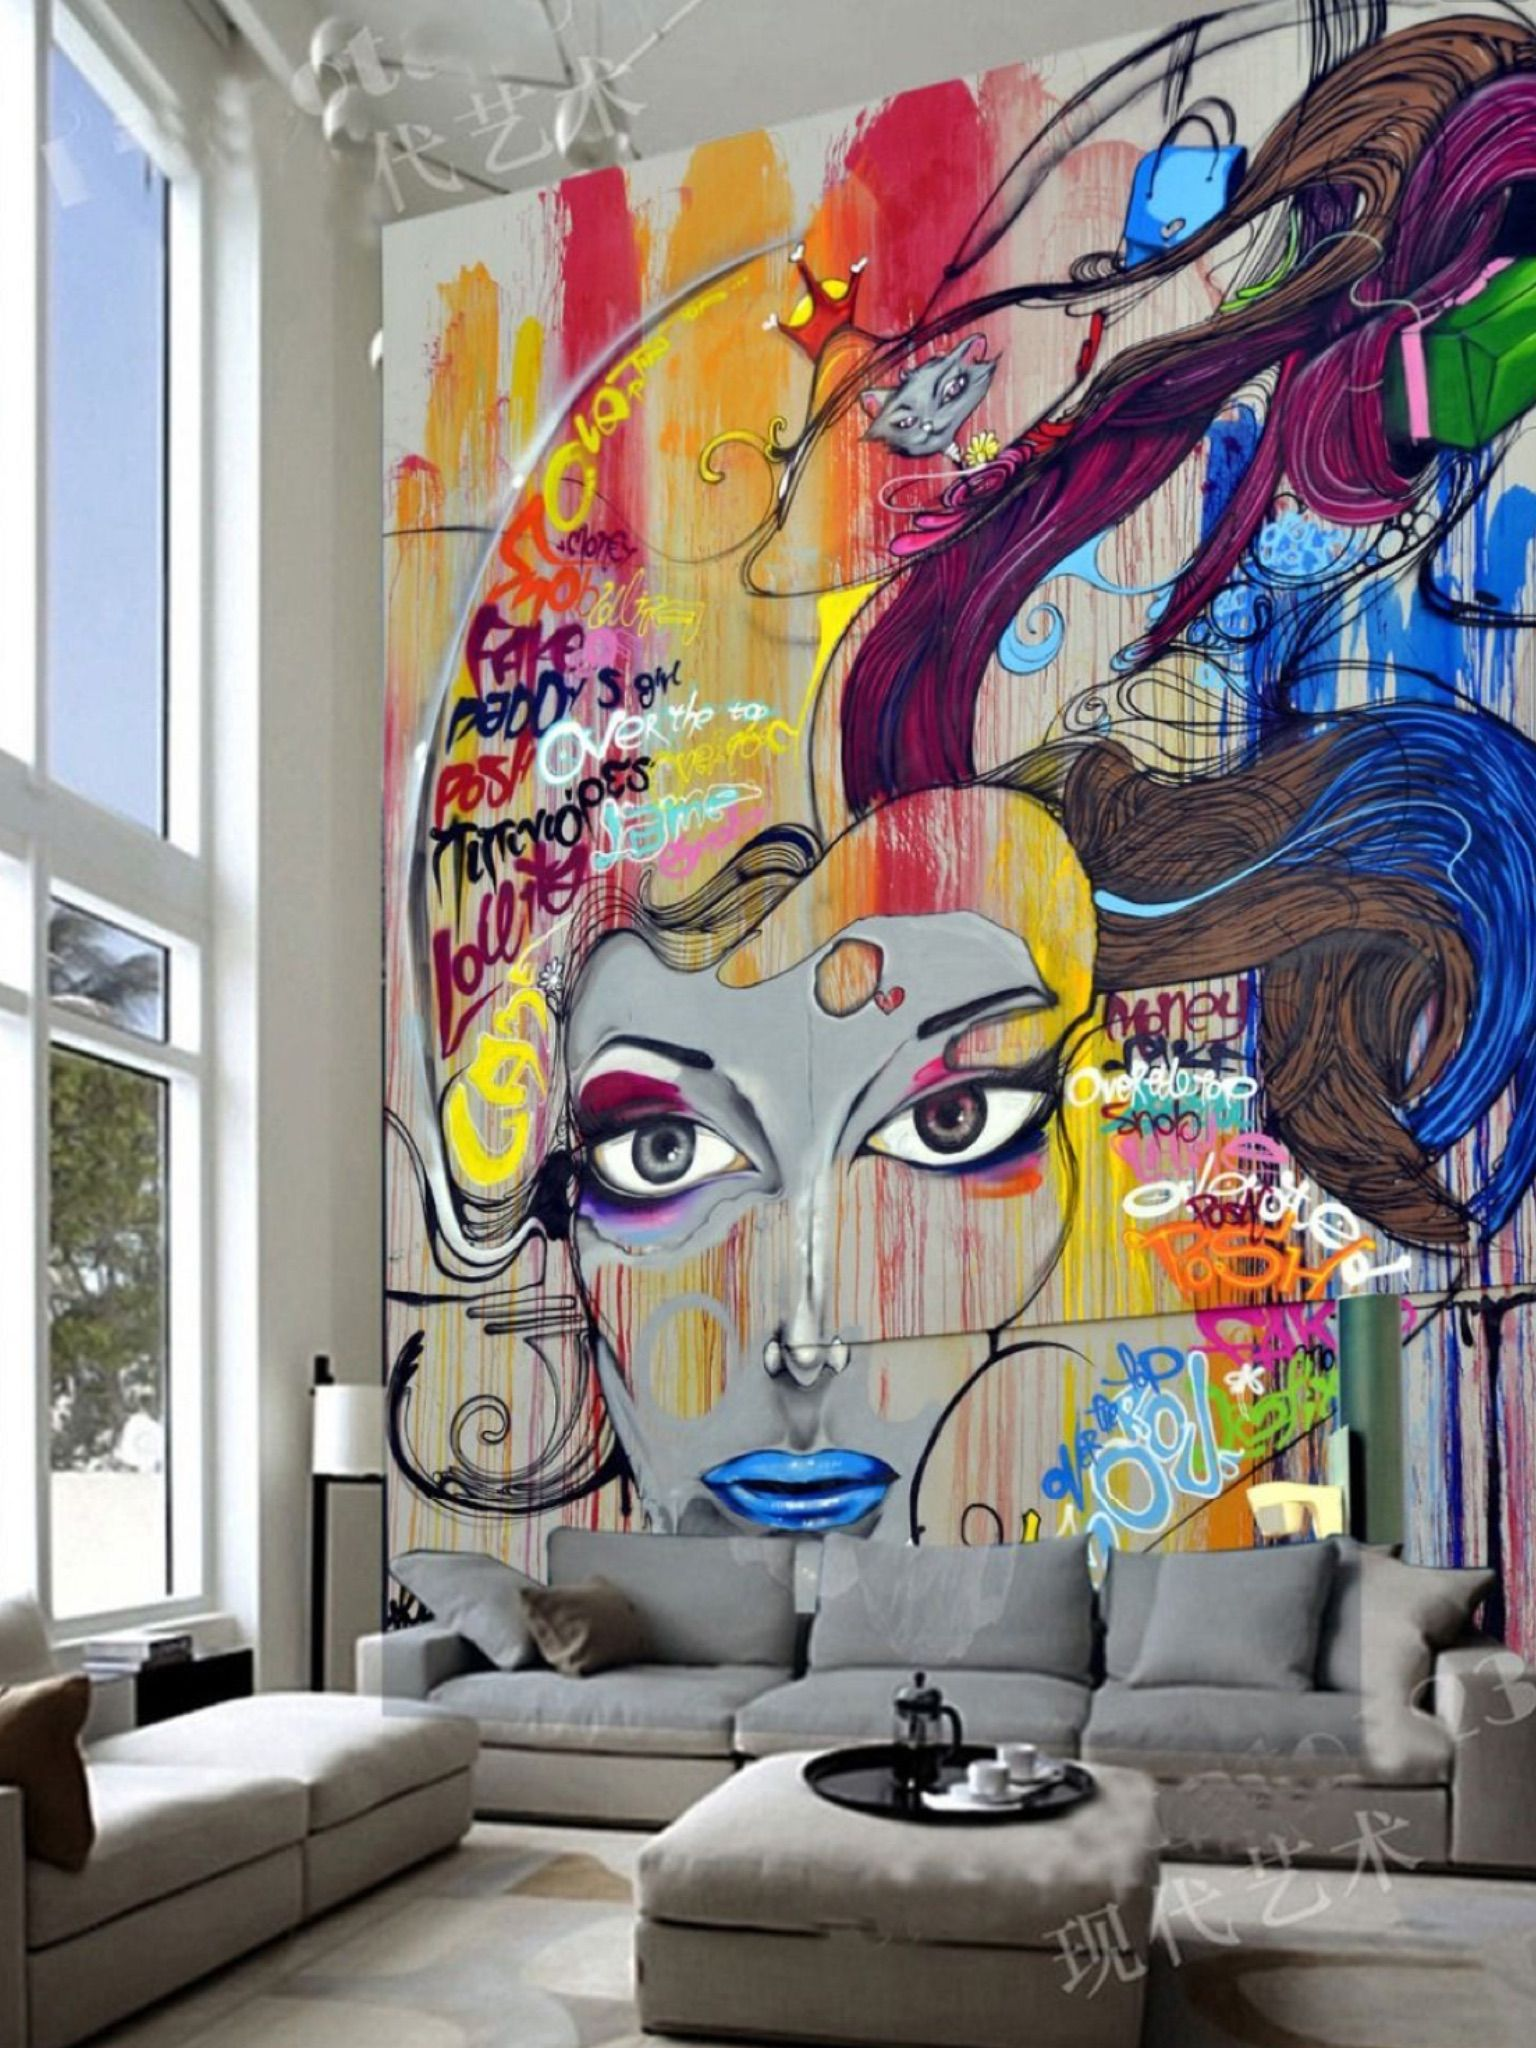 Pin By Terry On Color My World Graffiti Wallpaper Wall Murals Diy Mural Wallpaper